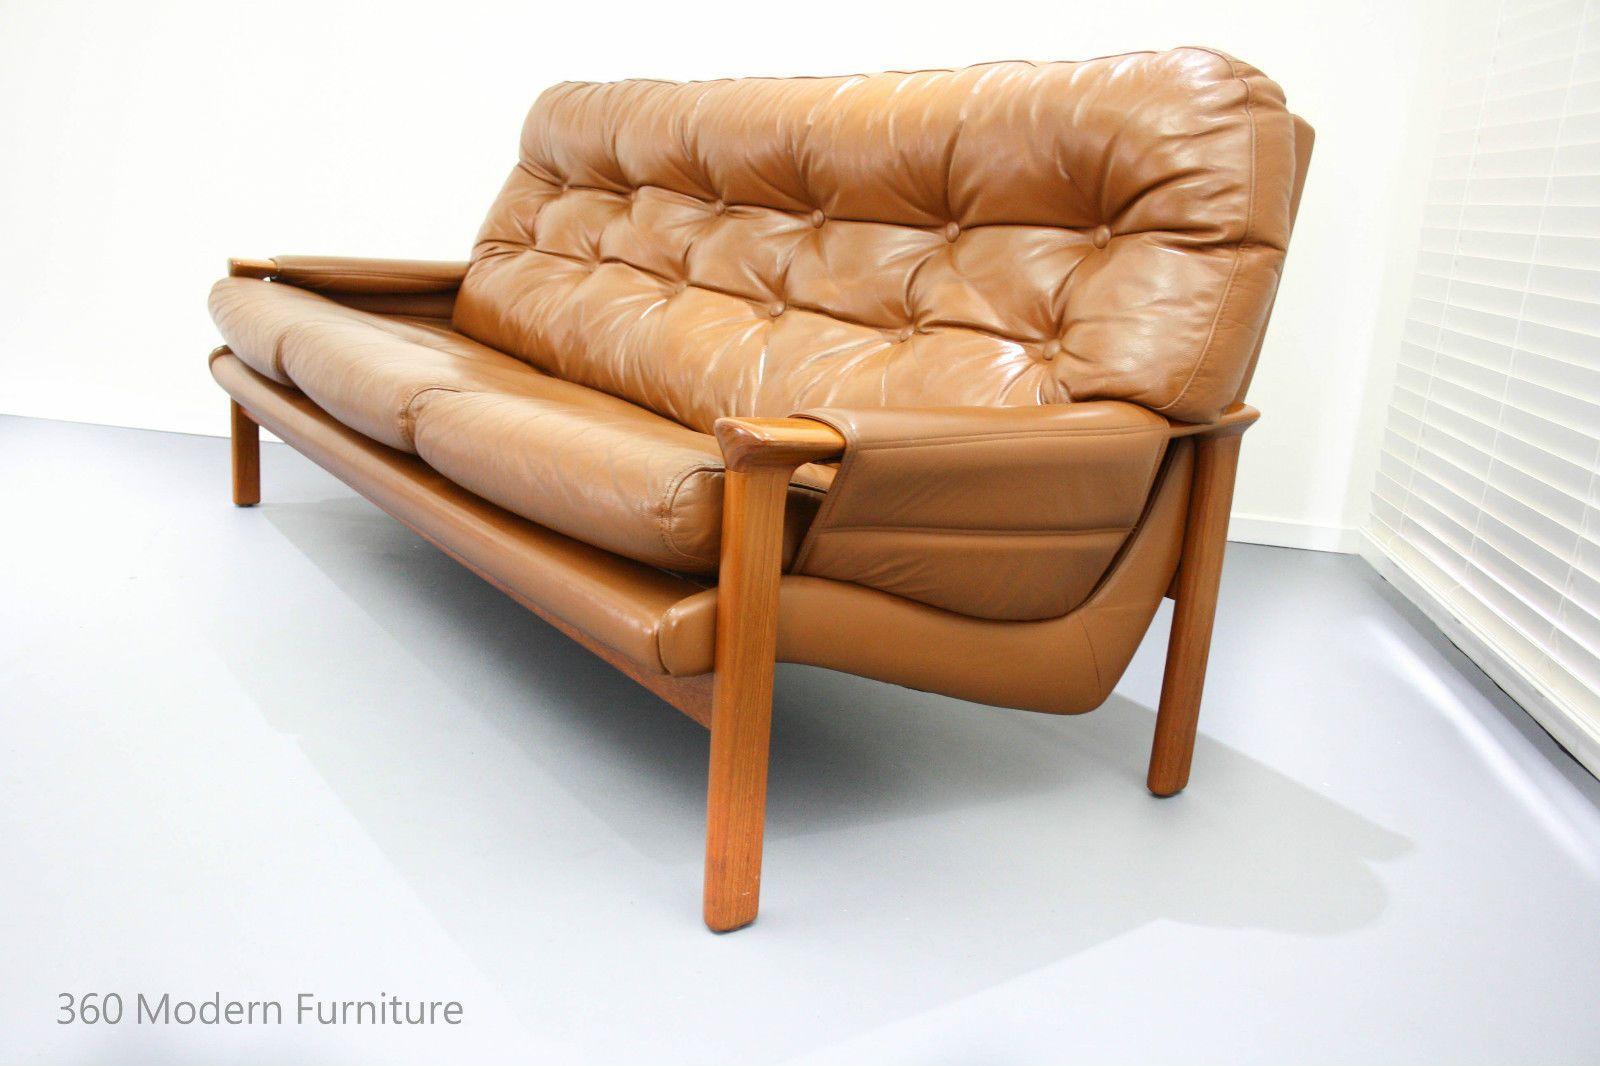 Tessa Leather 3 Seater 2 Armchairs Retro Vintage Lounge Suite Sofa Teak In Home Garden Furniture Sofas Couches